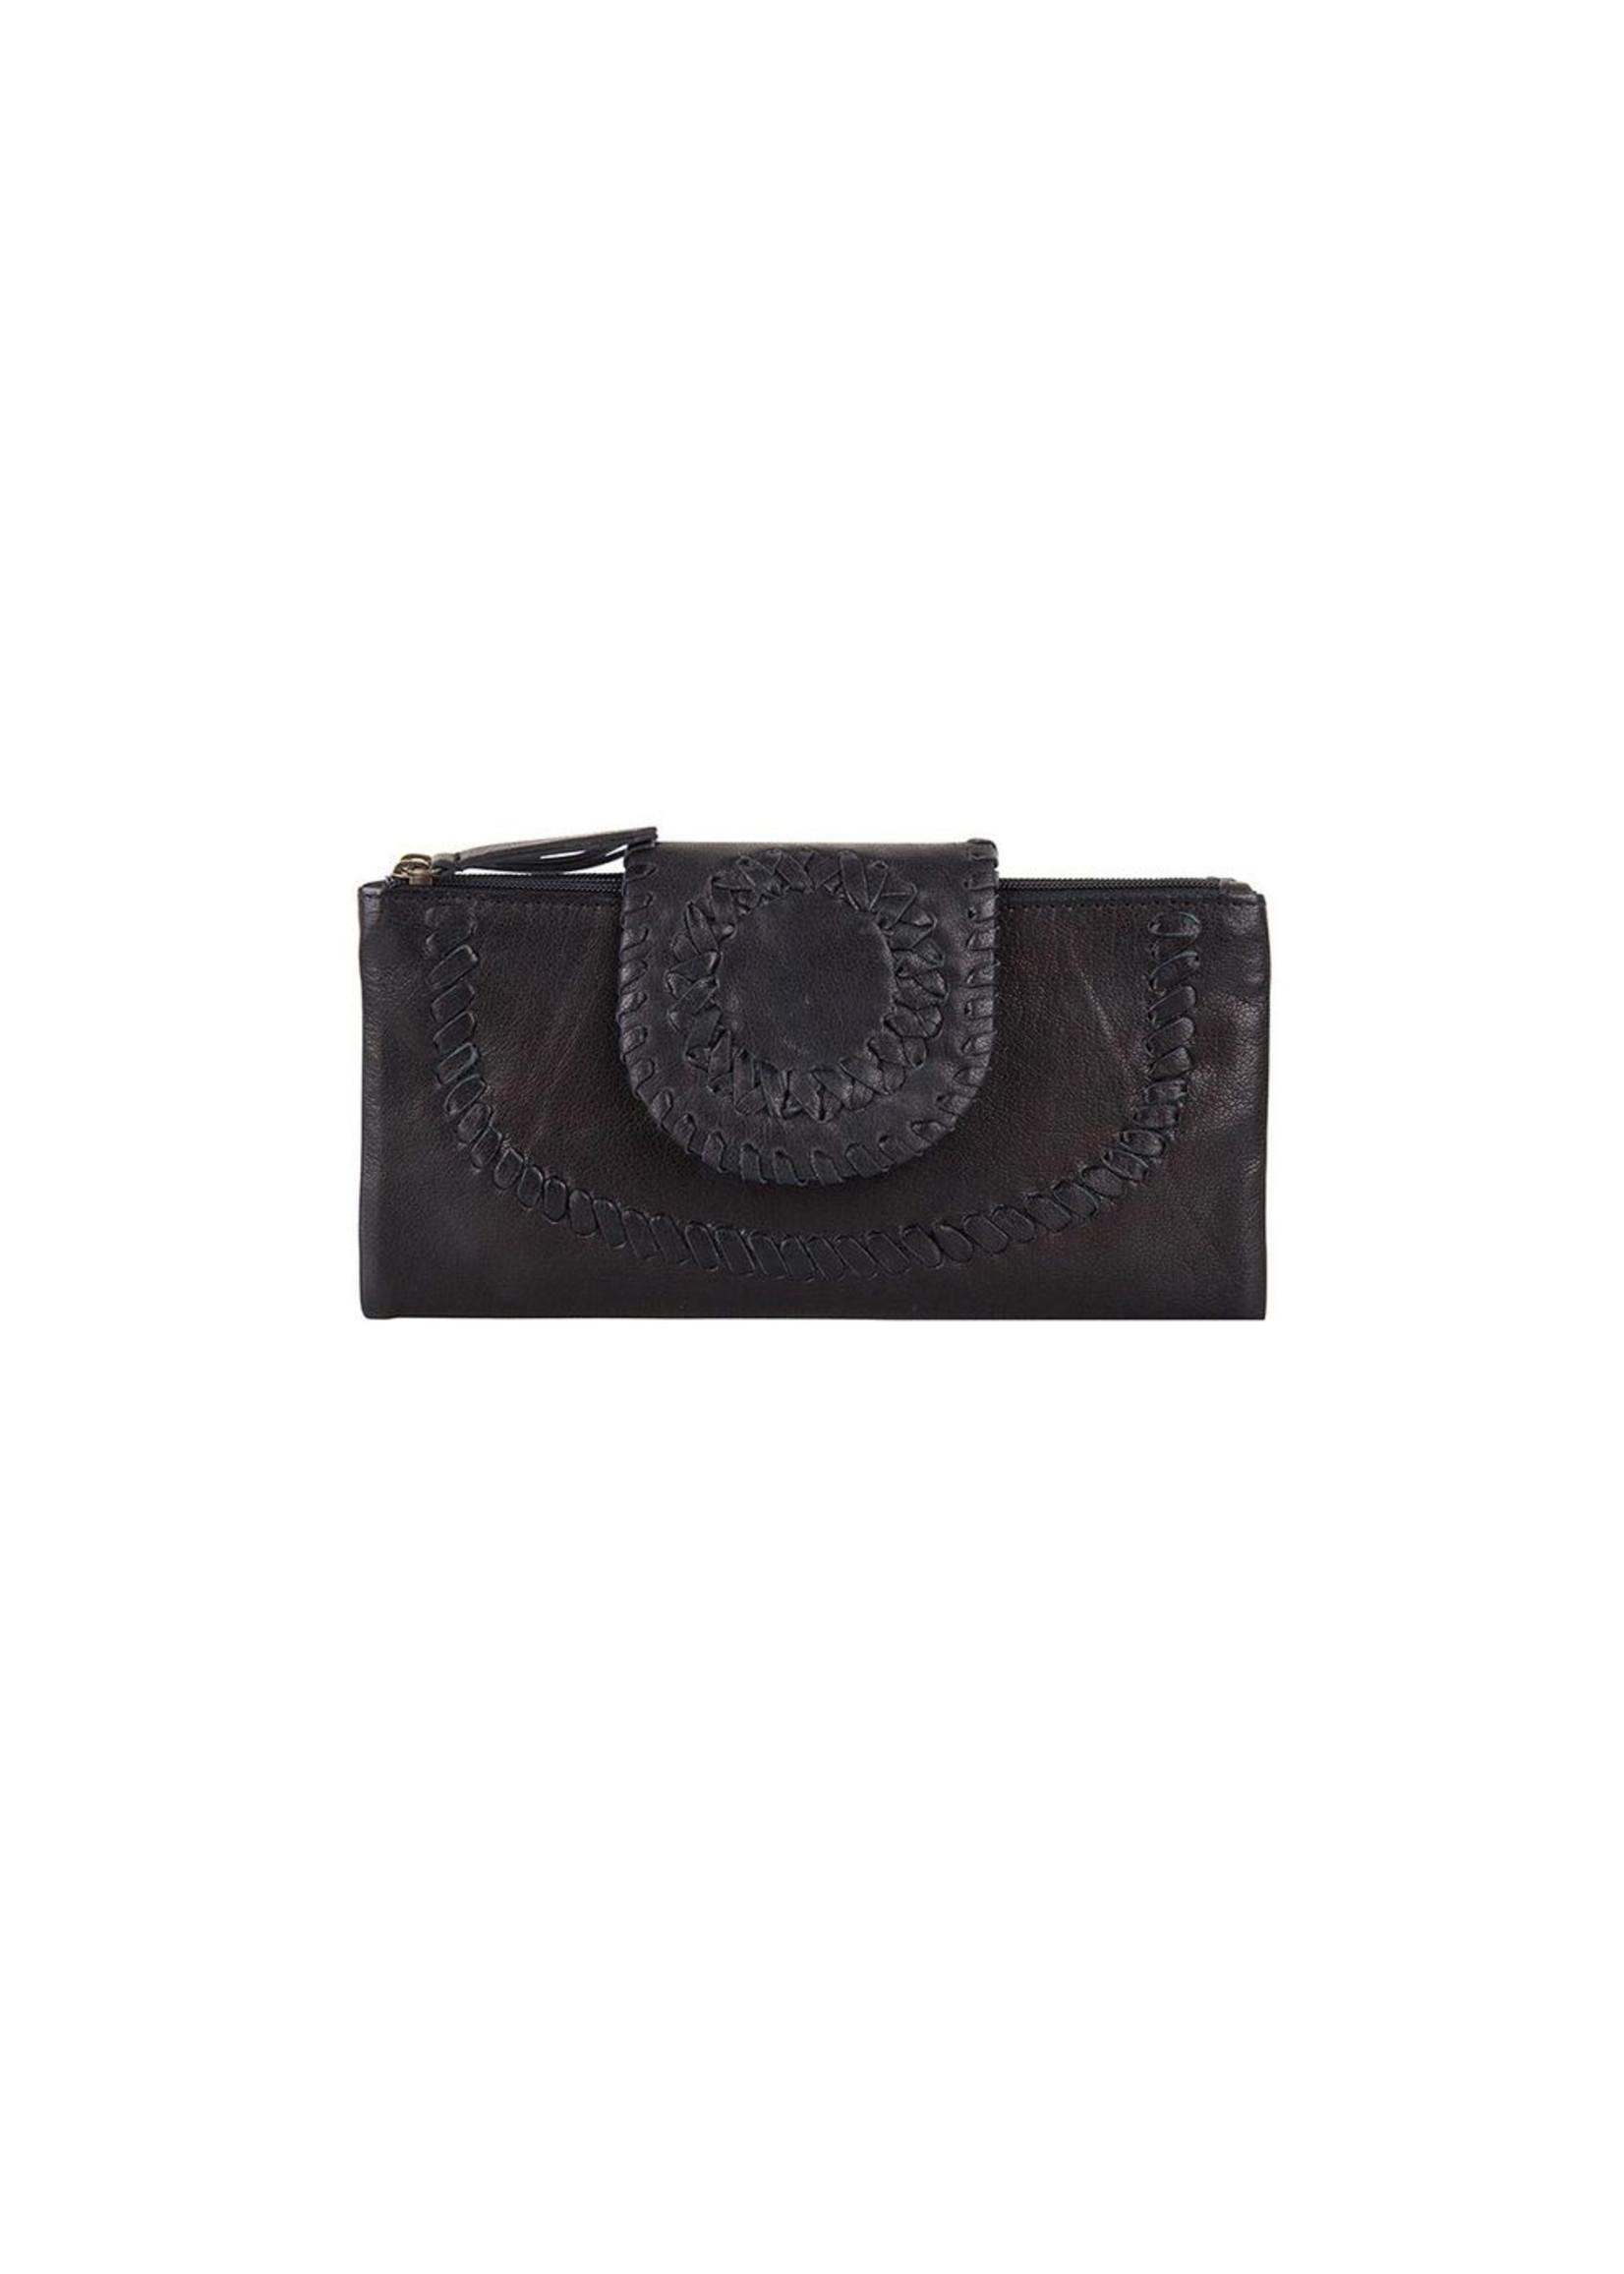 Chabo Bags Ladies Wallet Portemonnee Zwart